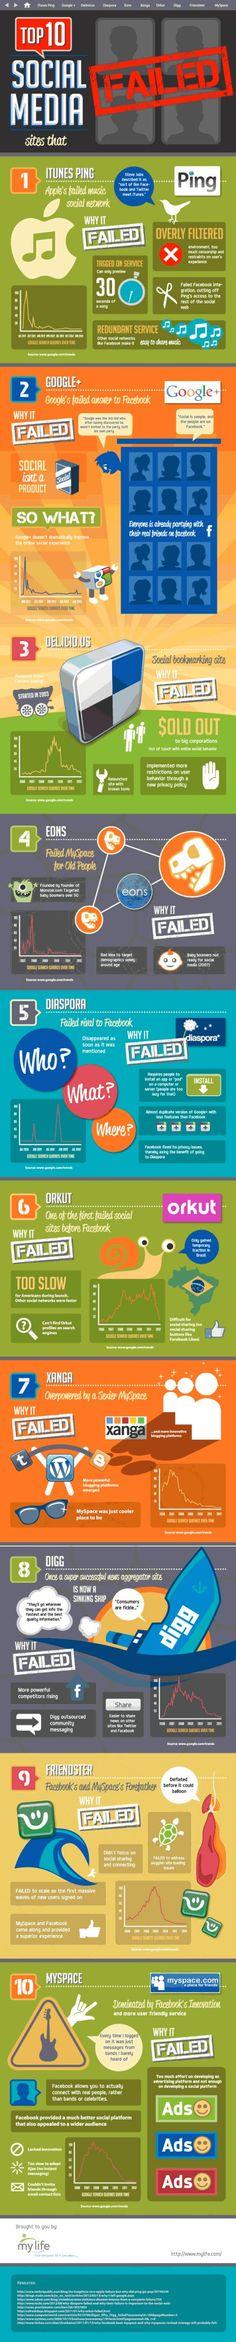 Social Media Flops - welche sozialen Netzwerke sind die Verlierer des Social Webs? http://tobesocial.de/blog/social-media-flops-facebook-marketing-pinterest-erfolg